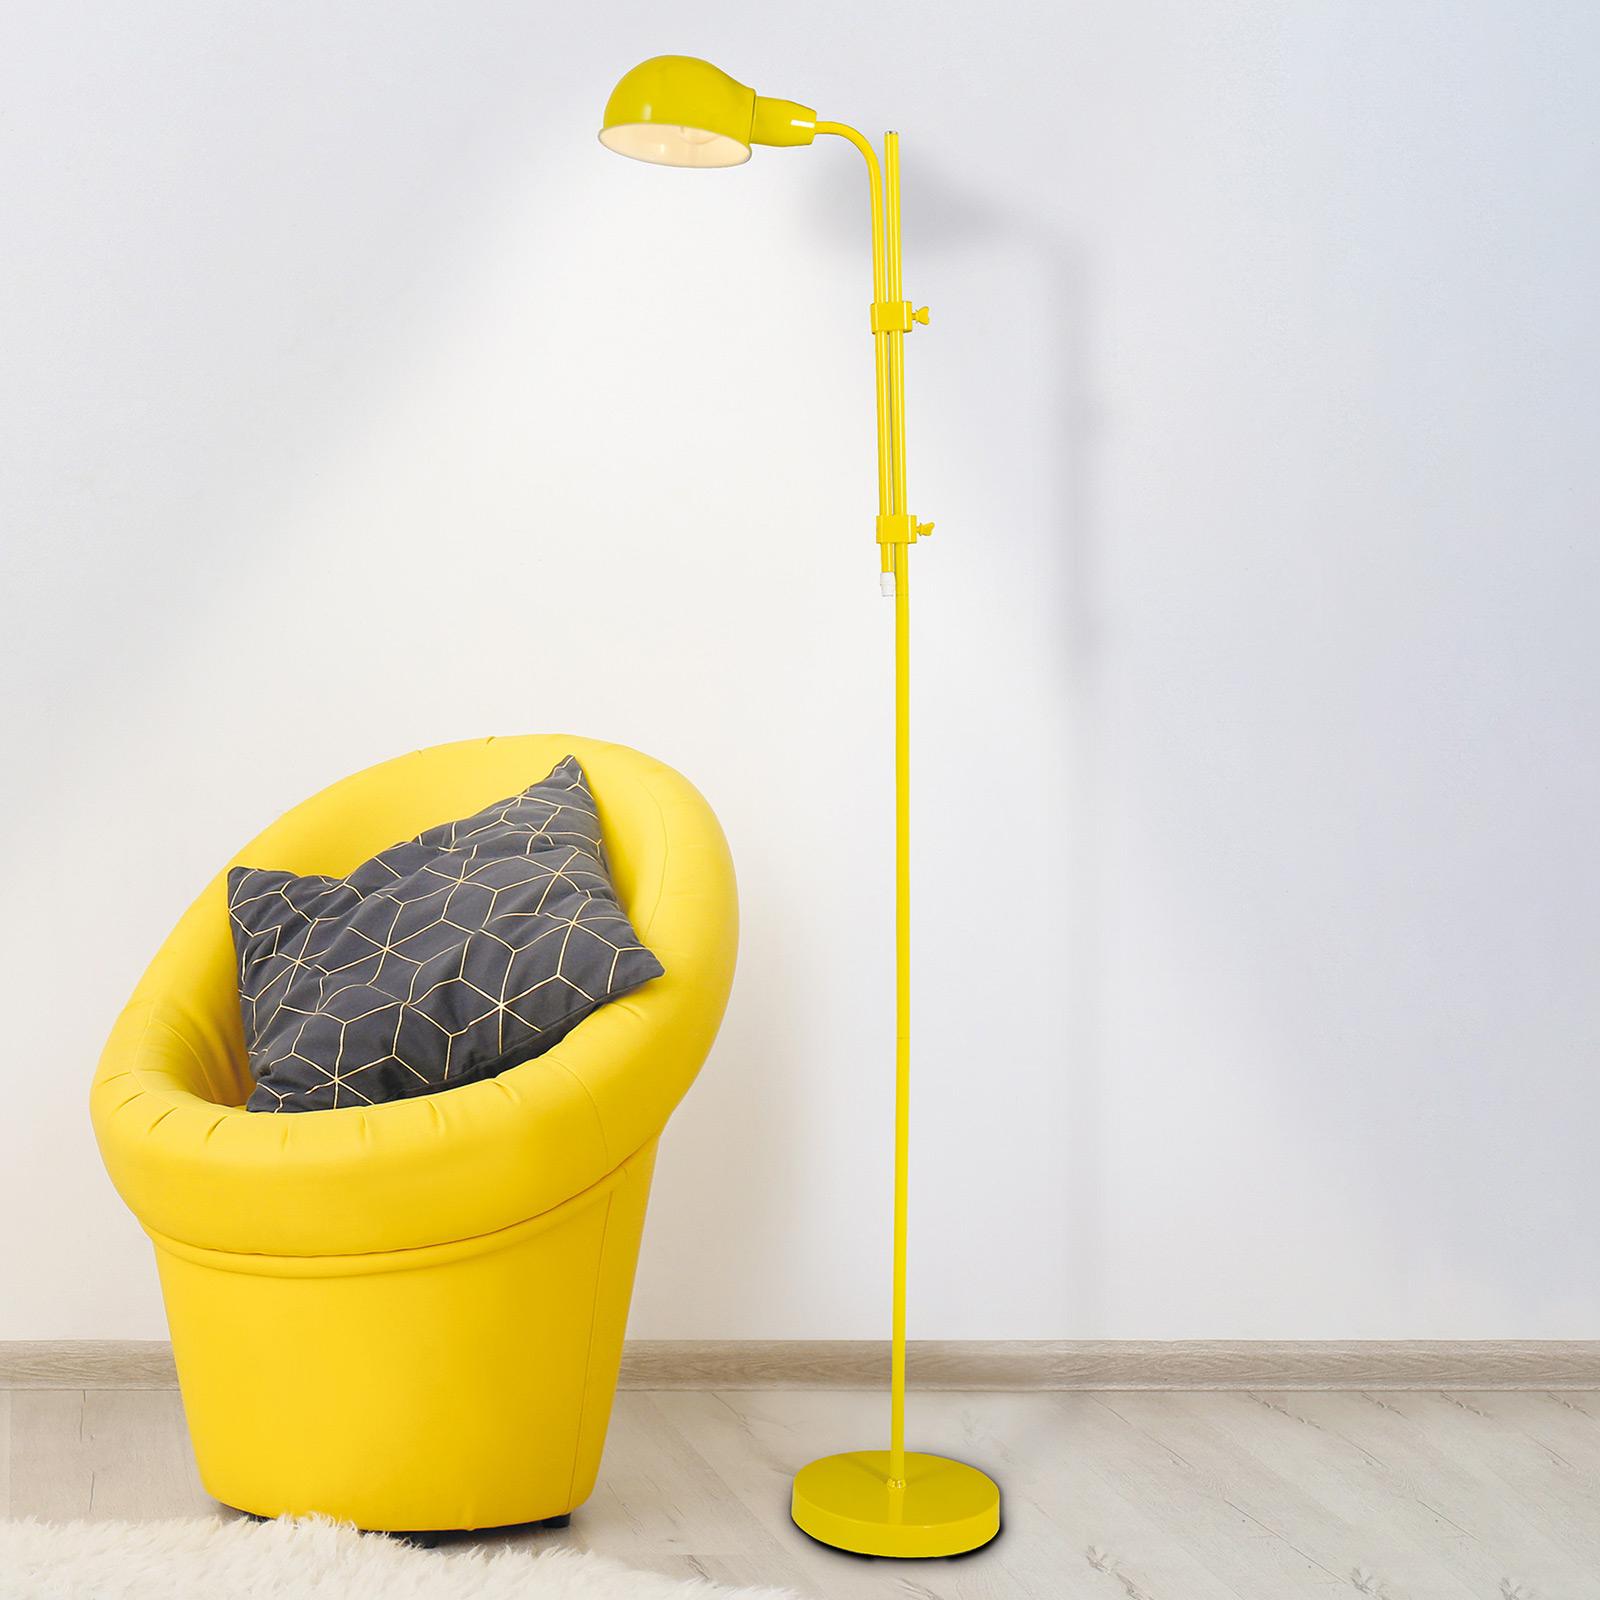 Vloerlamp Alani met klik-schakelaar, geel